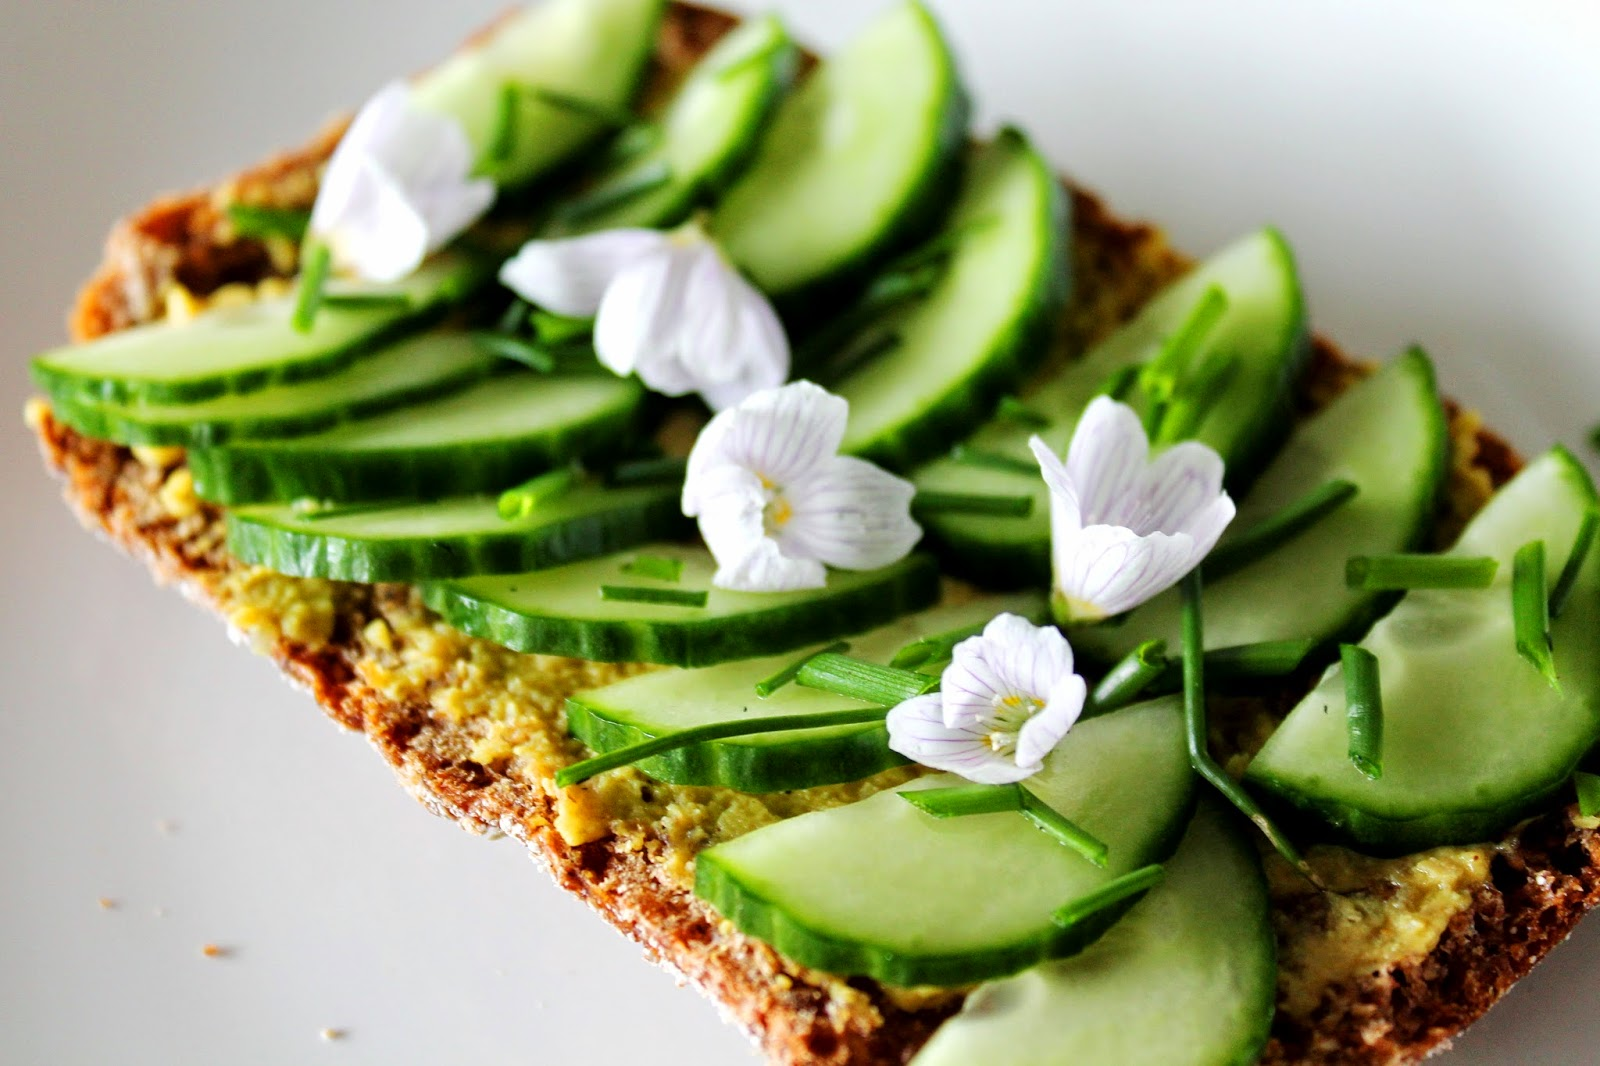 Rye bread with hummus, cucumber, chive and wood sorrel flowers | Alinan kotona blog